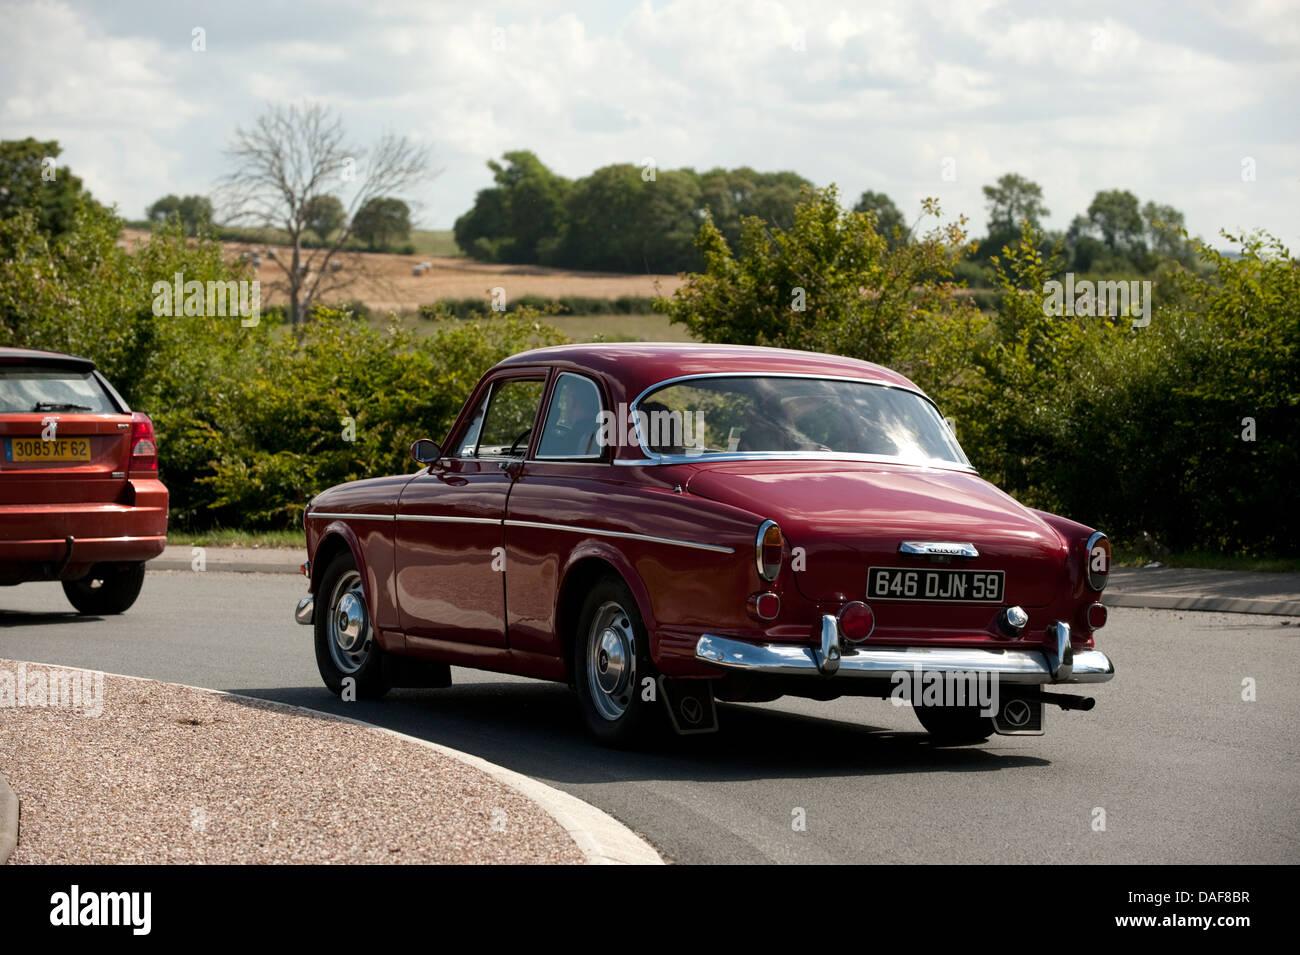 Classic Old Volvo Car Condette France Stock Photo 58113547